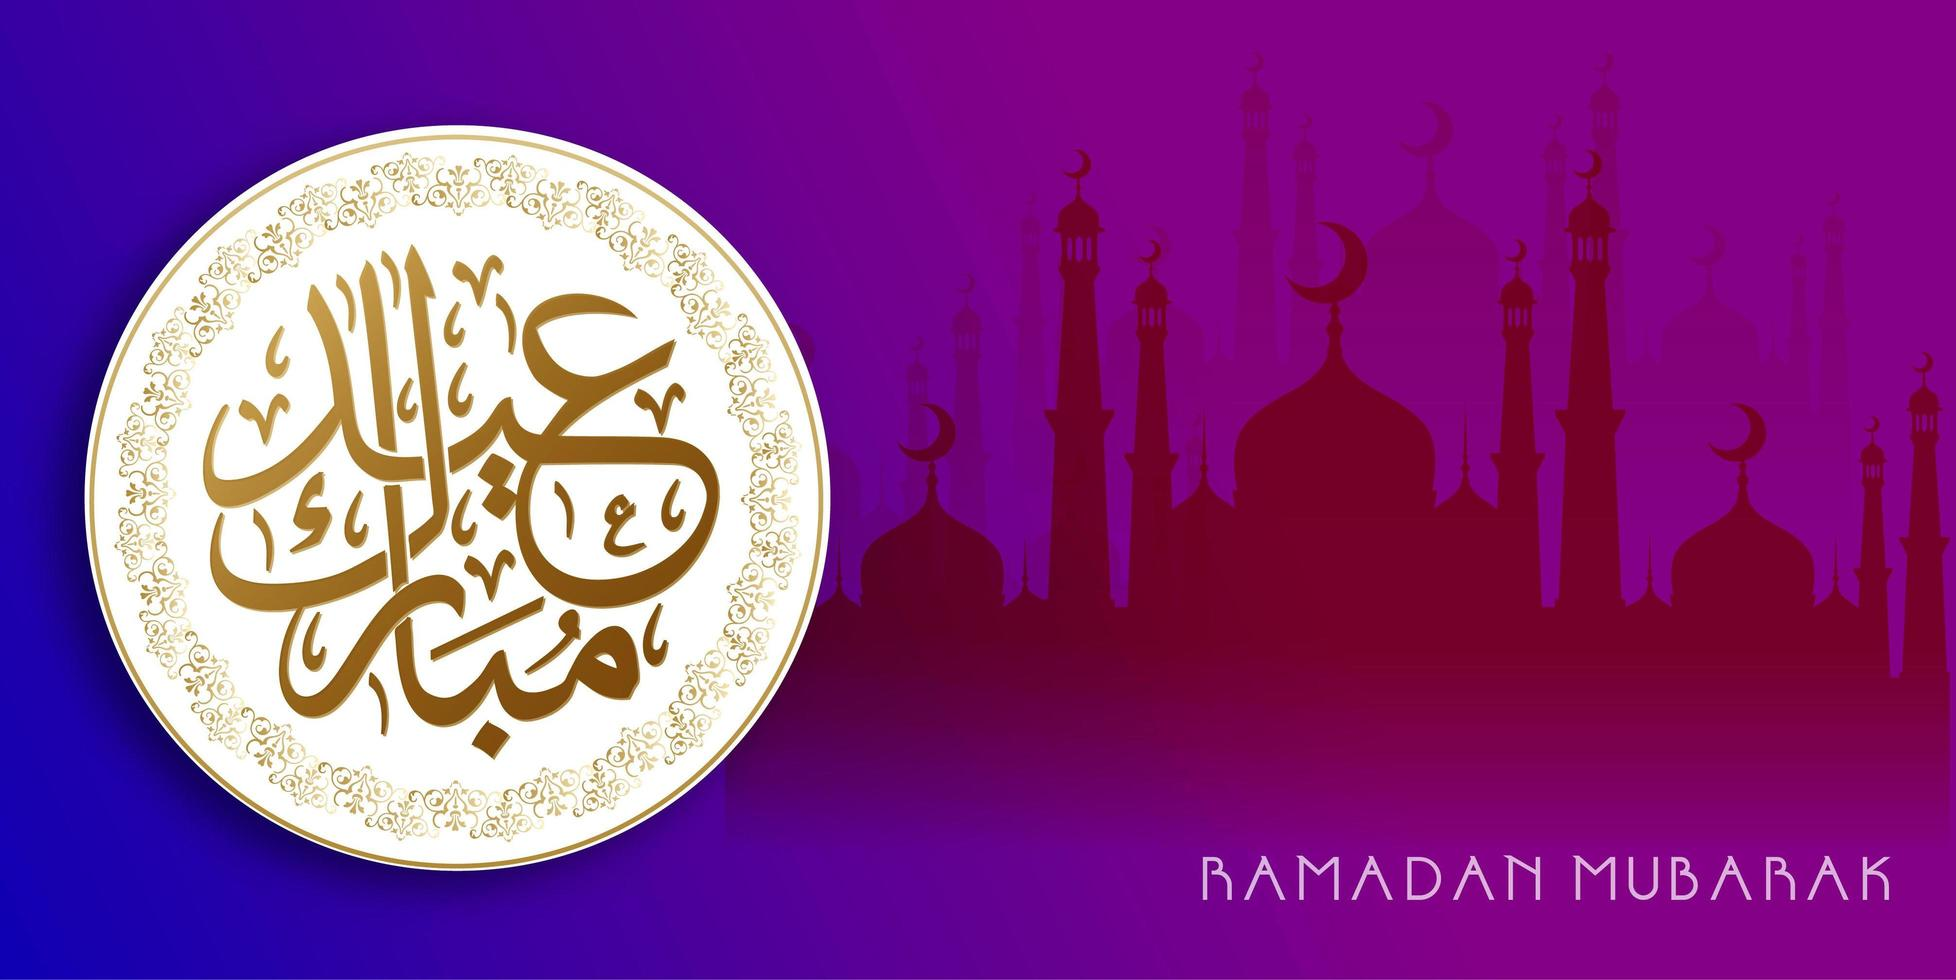 Ramadan Kareem blau rosa Farbverlauf Hintergrund vektor